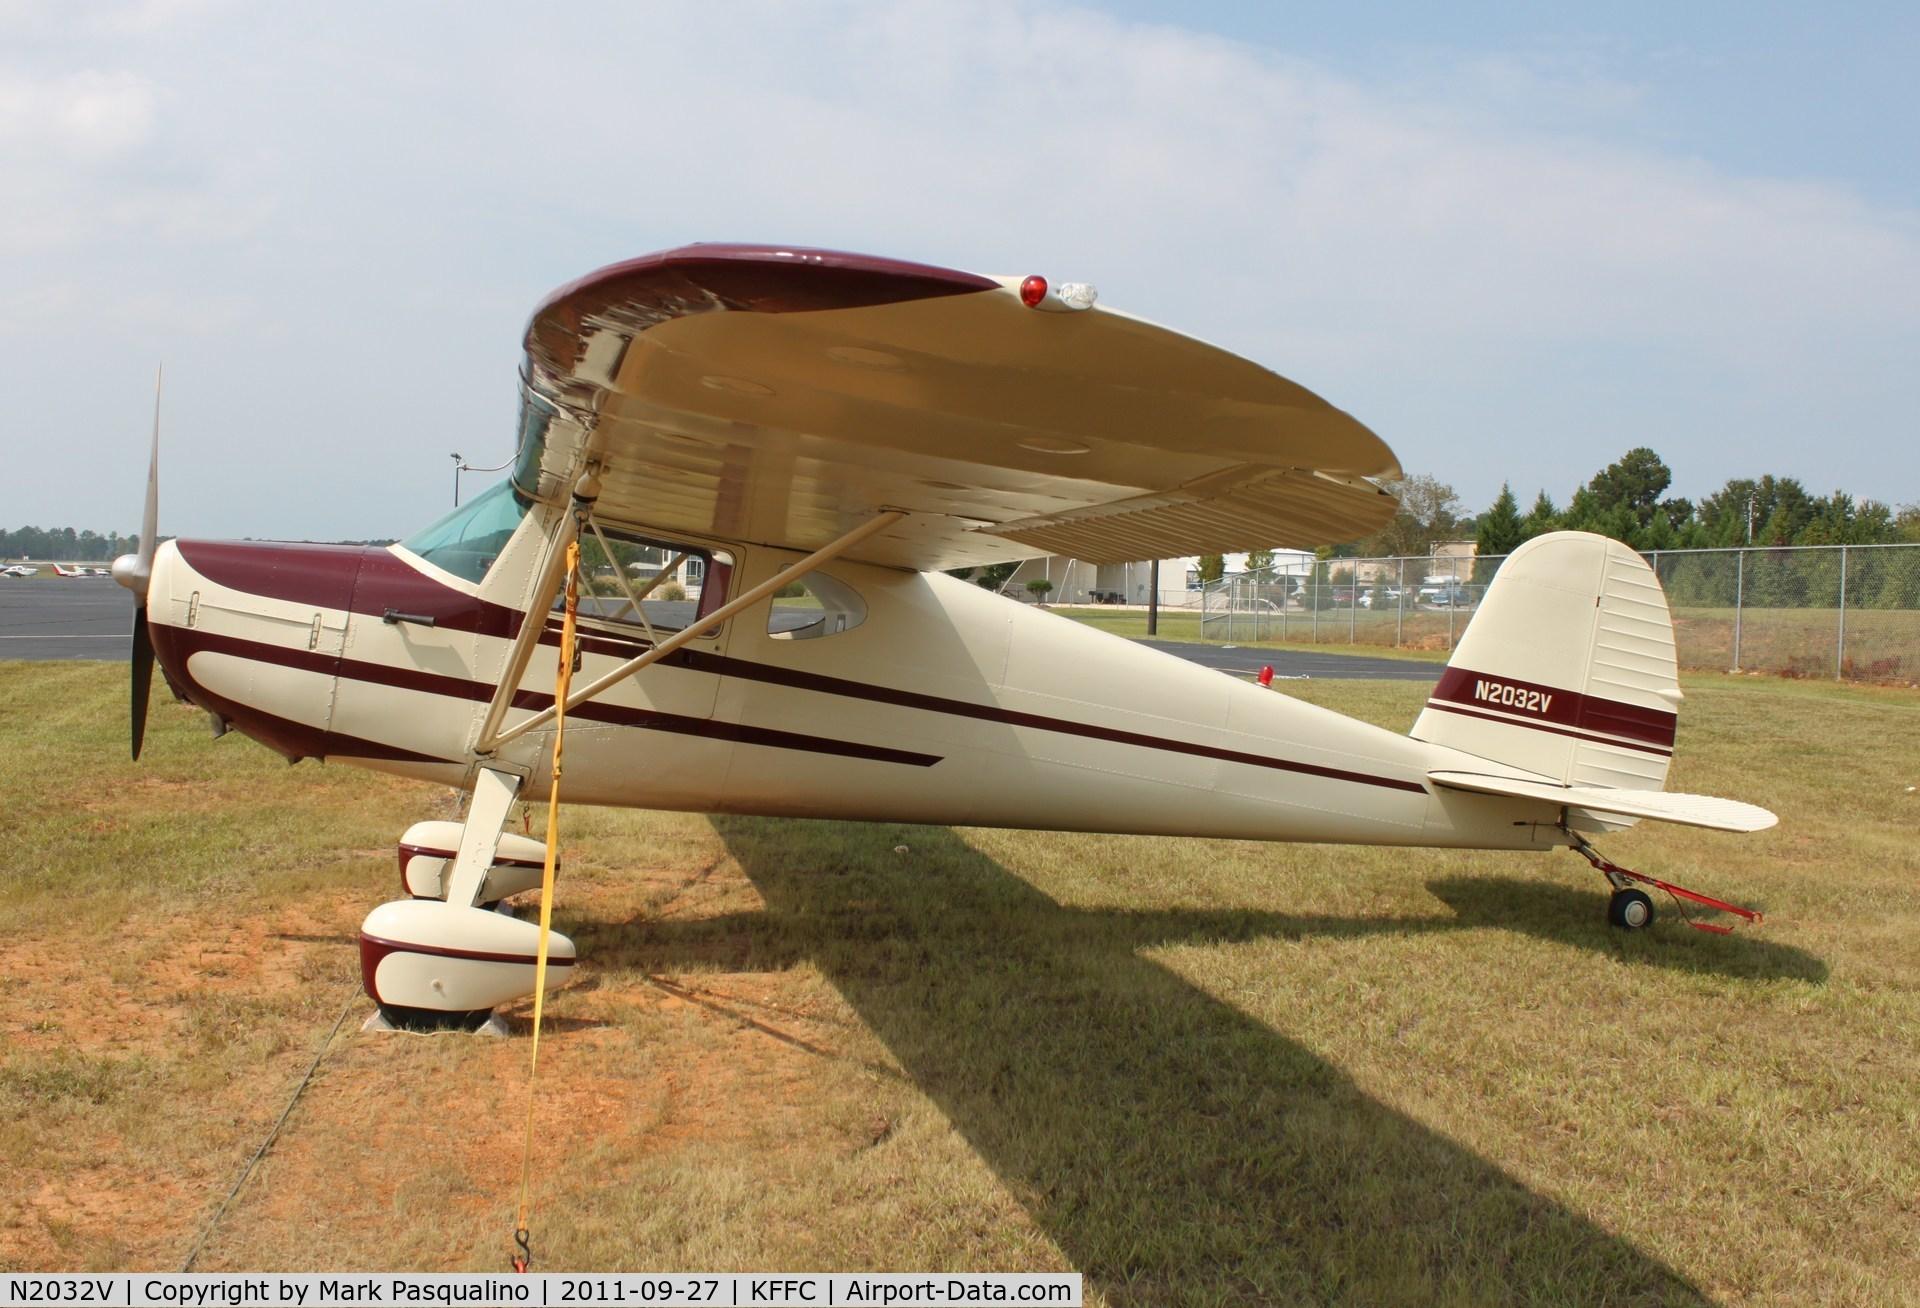 N2032V, 1947 Cessna 120 C/N 14245, Cessna 120